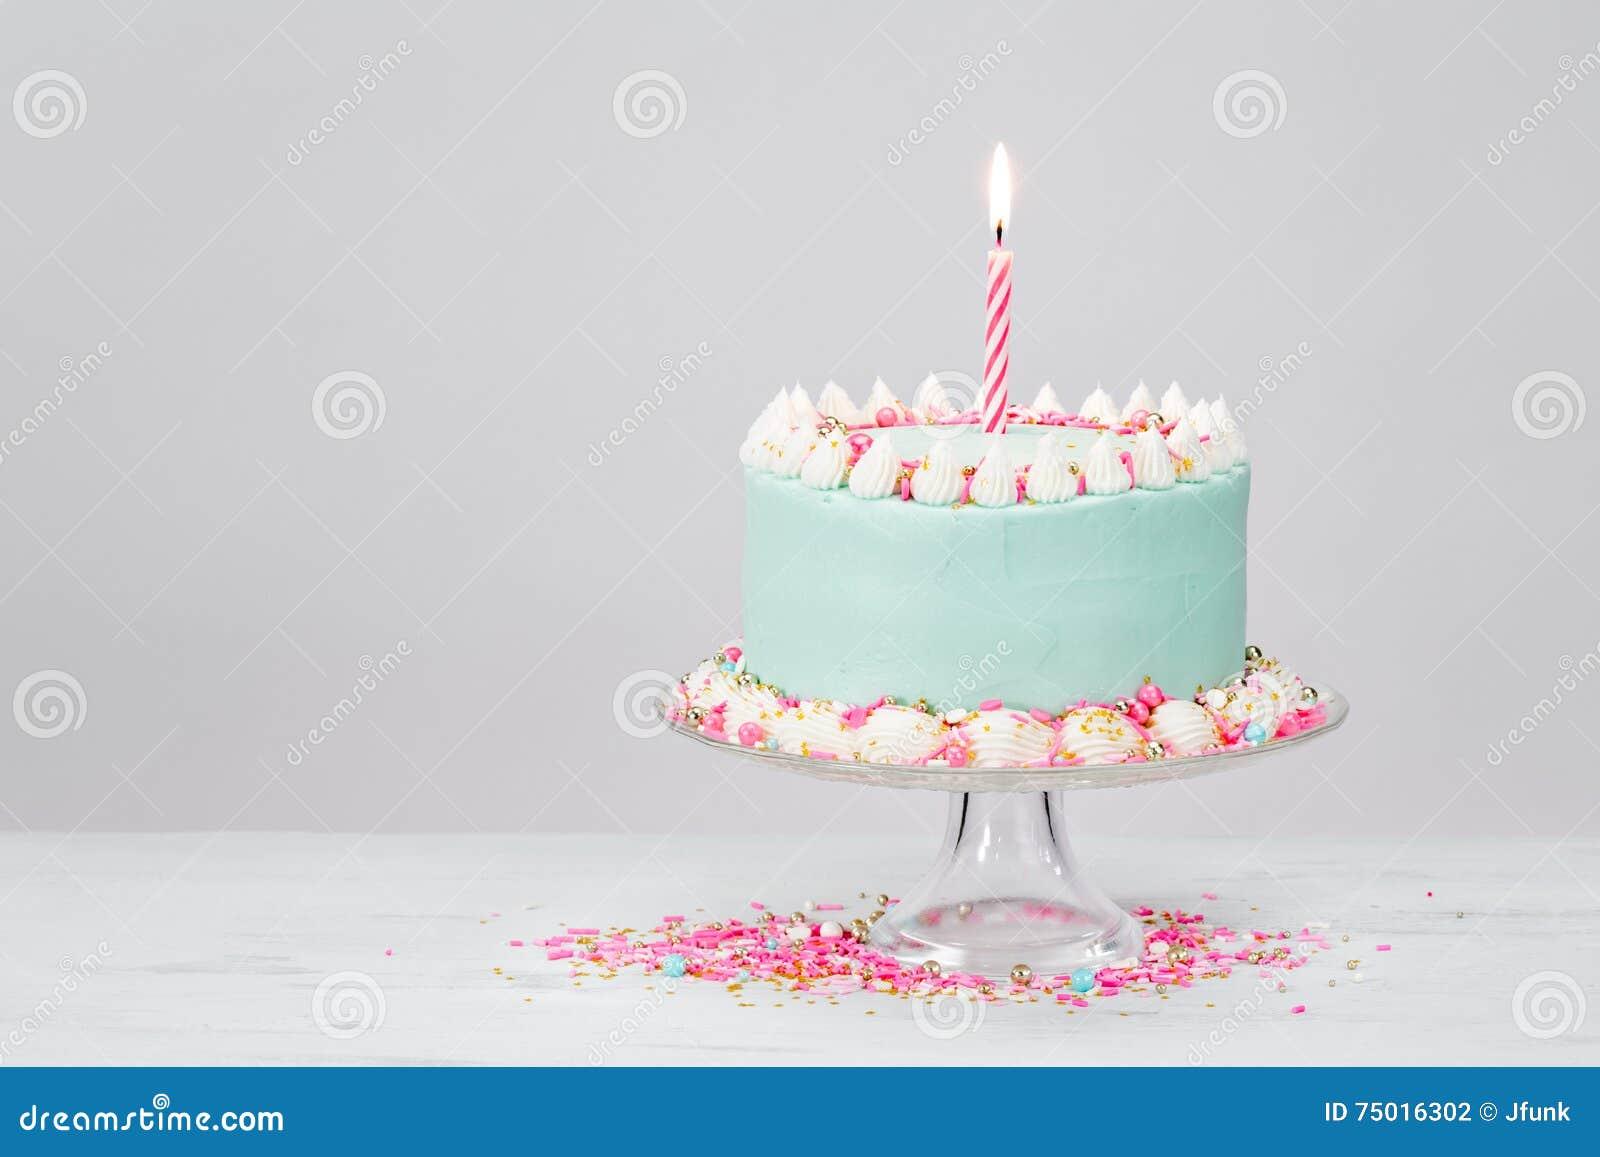 Bolo de aniversário azul pastel sobre o fundo branco